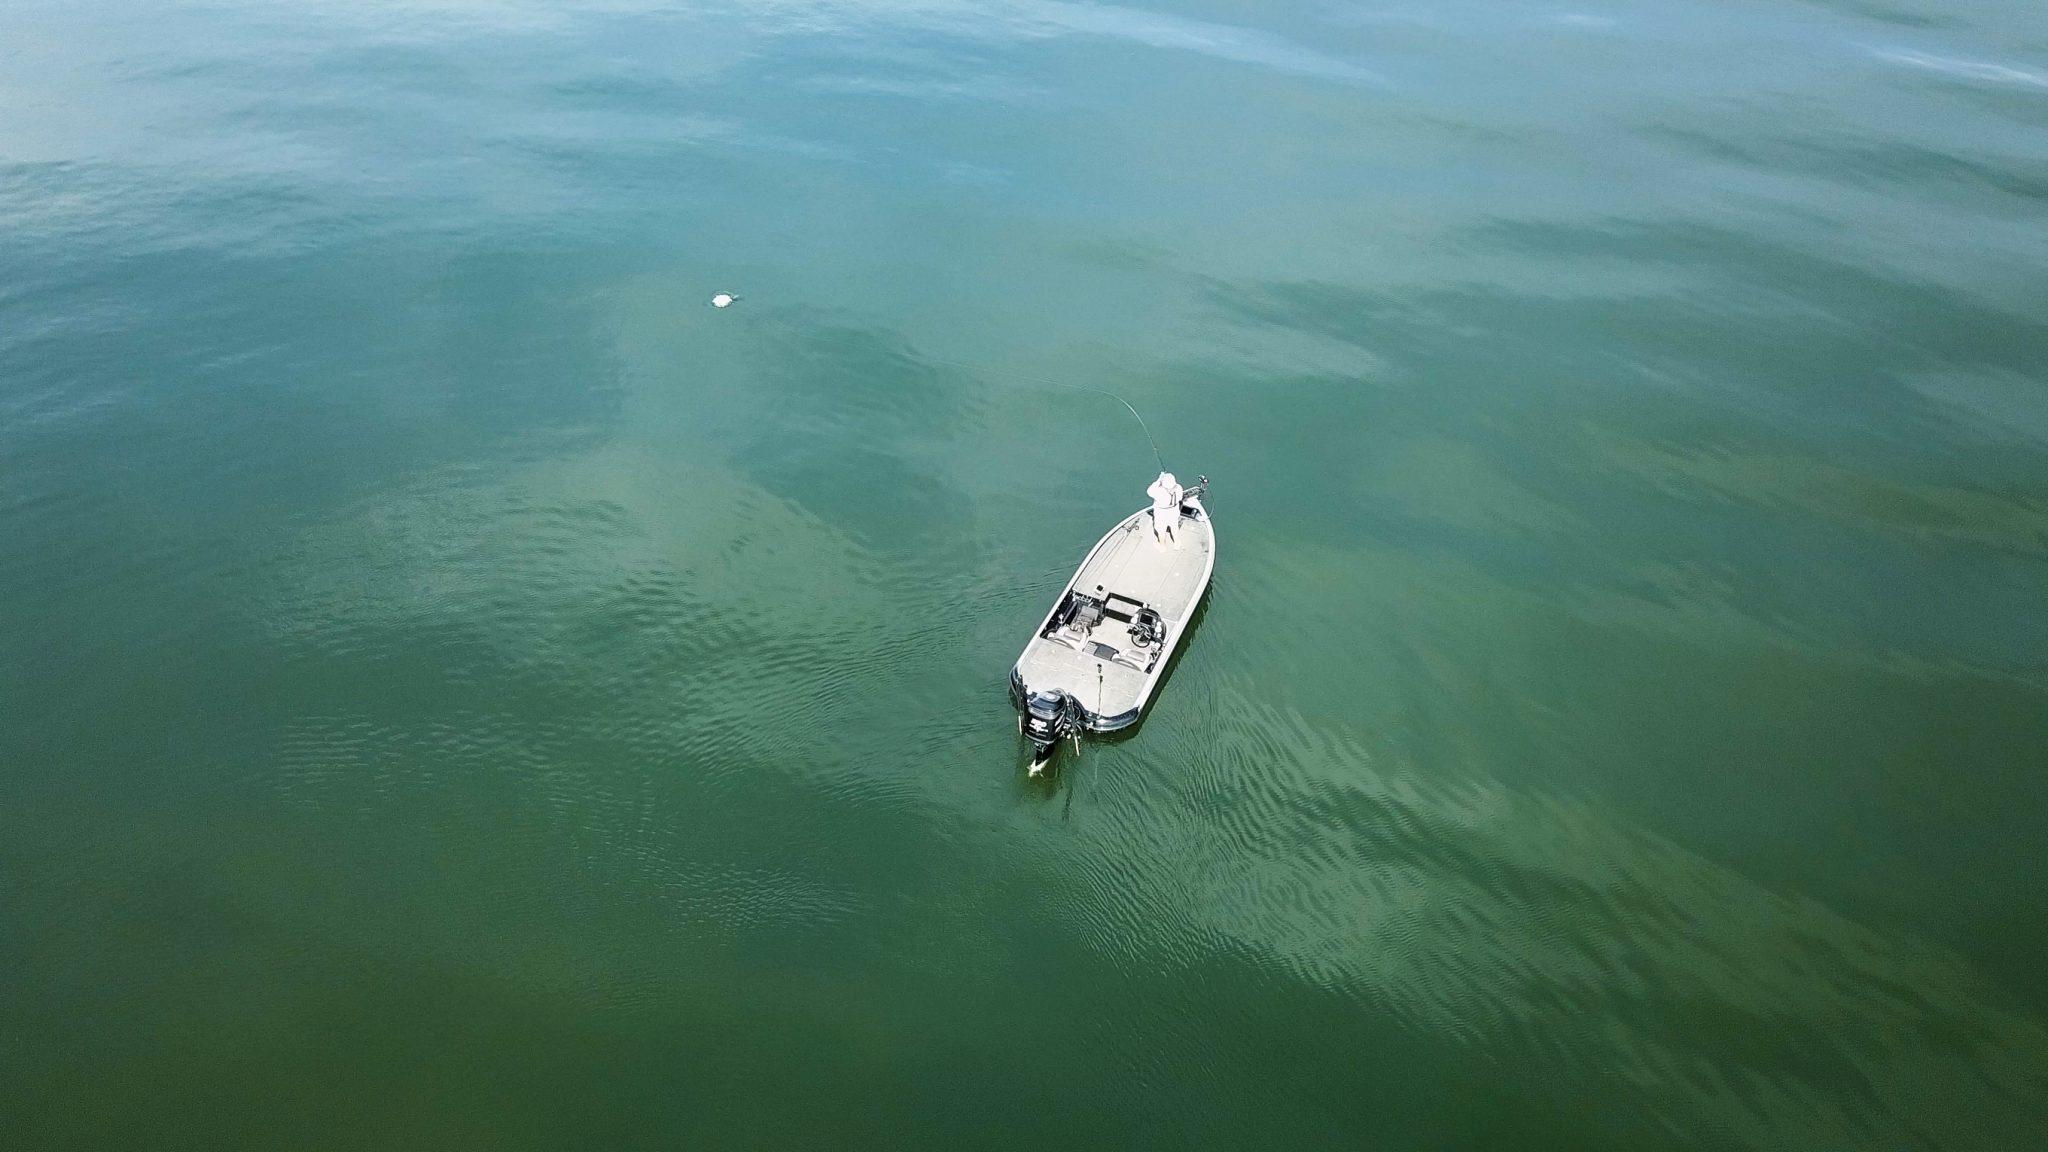 TAC 301 – Fishing the Super Fluke for Smallmouth